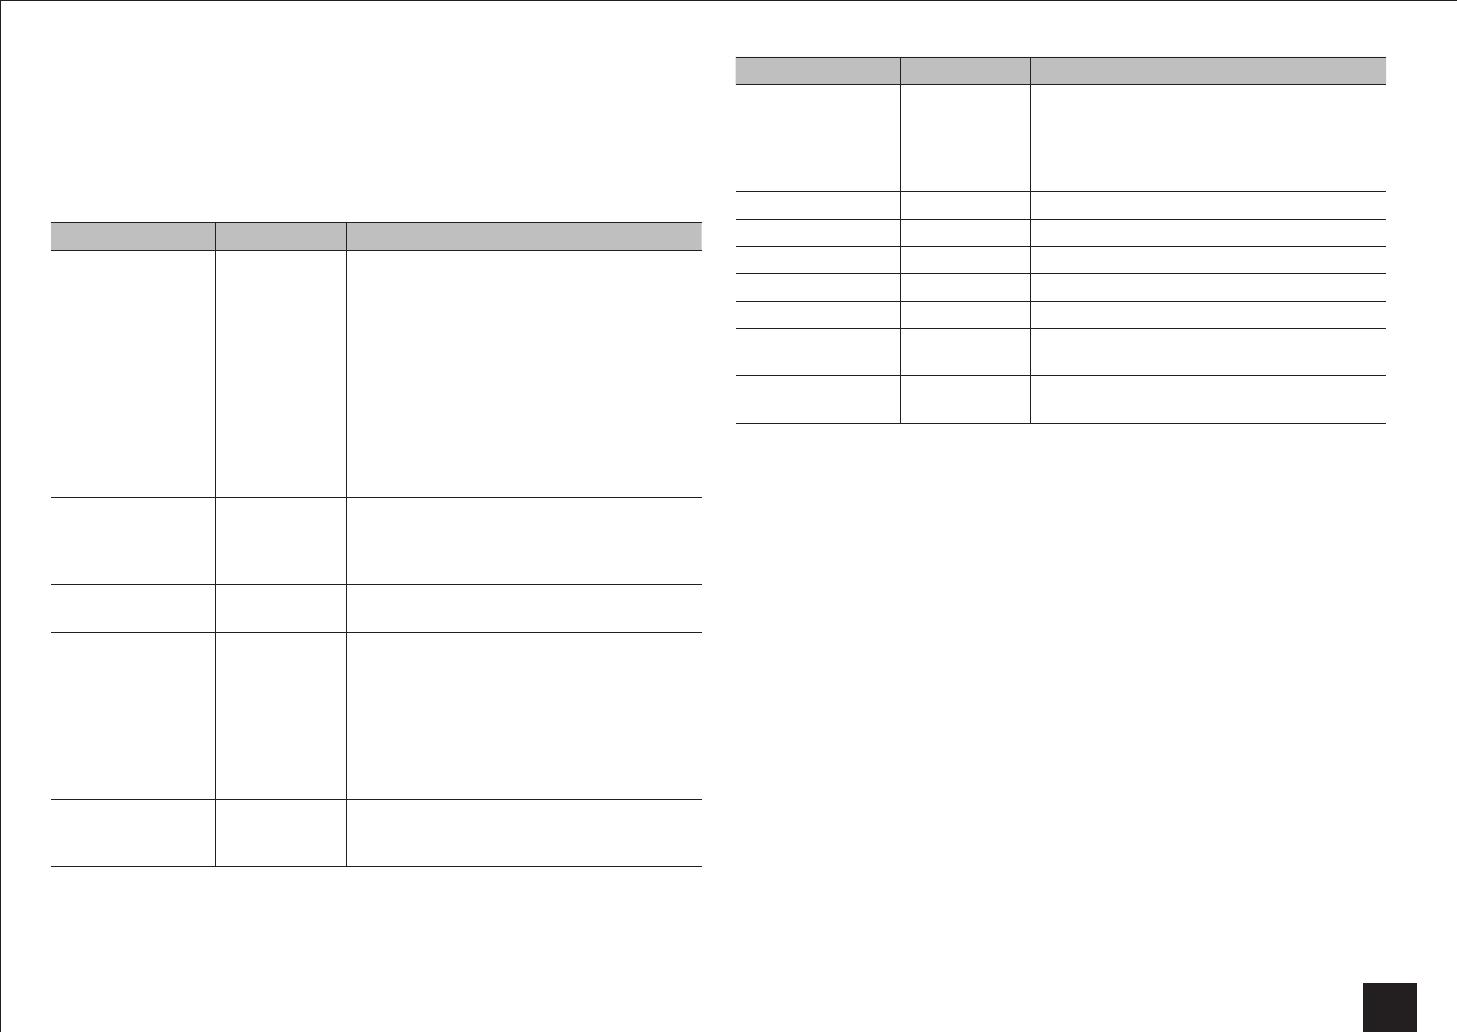 Handleiding Onkyo TX-NR636 (pagina 37 van 89) (English)